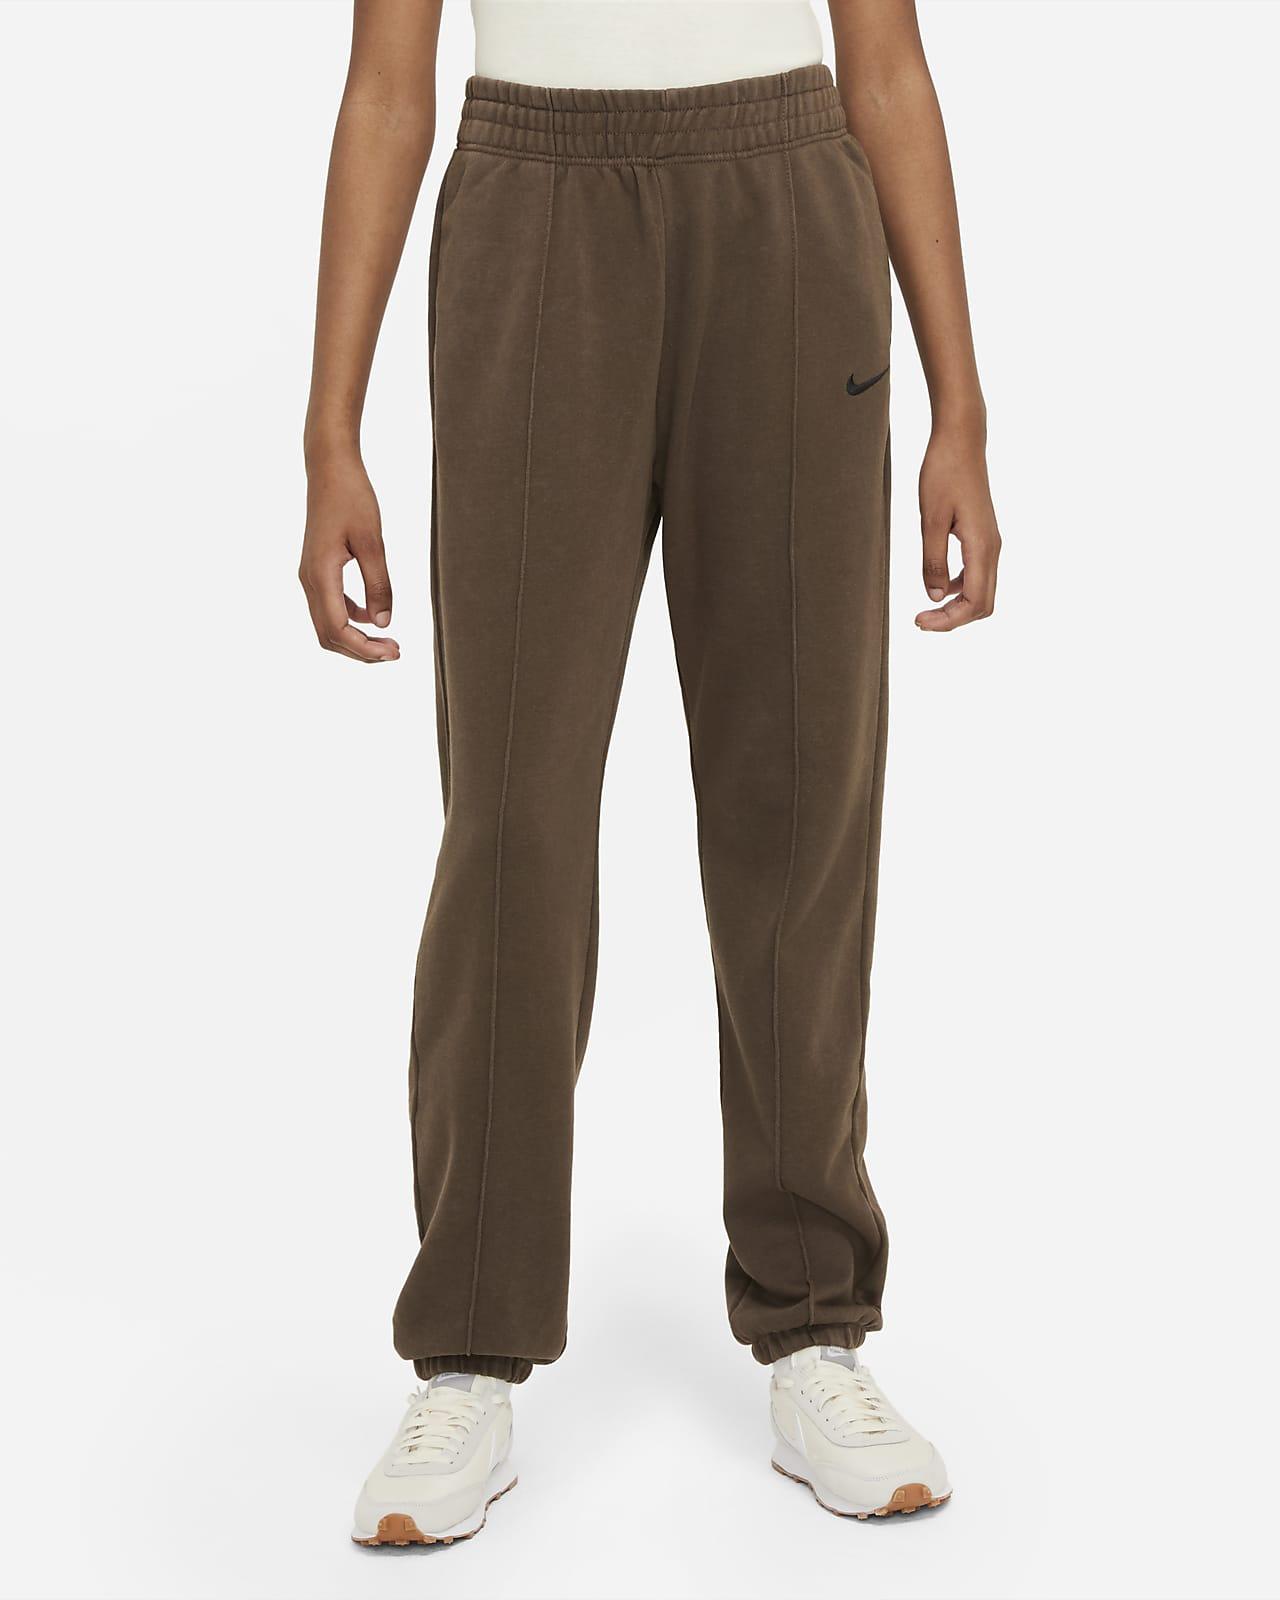 Nike Sportswear Essential Collection Pantalón de tejido Fleece lavado - Mujer